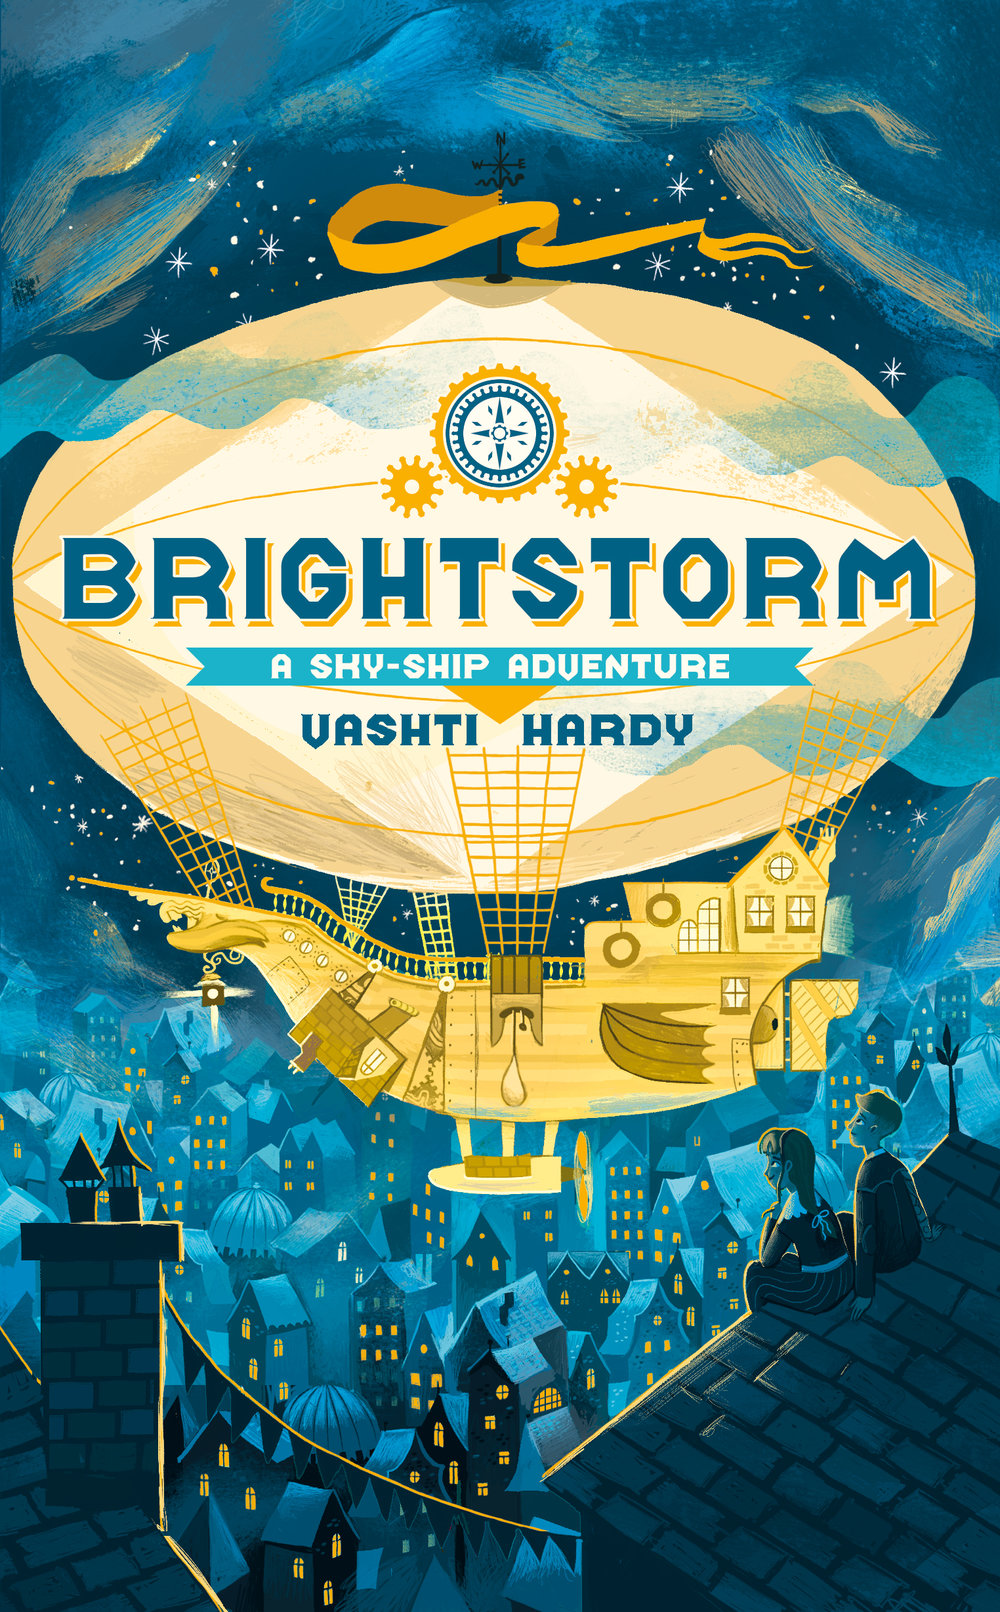 Copy of Brightstorm poster